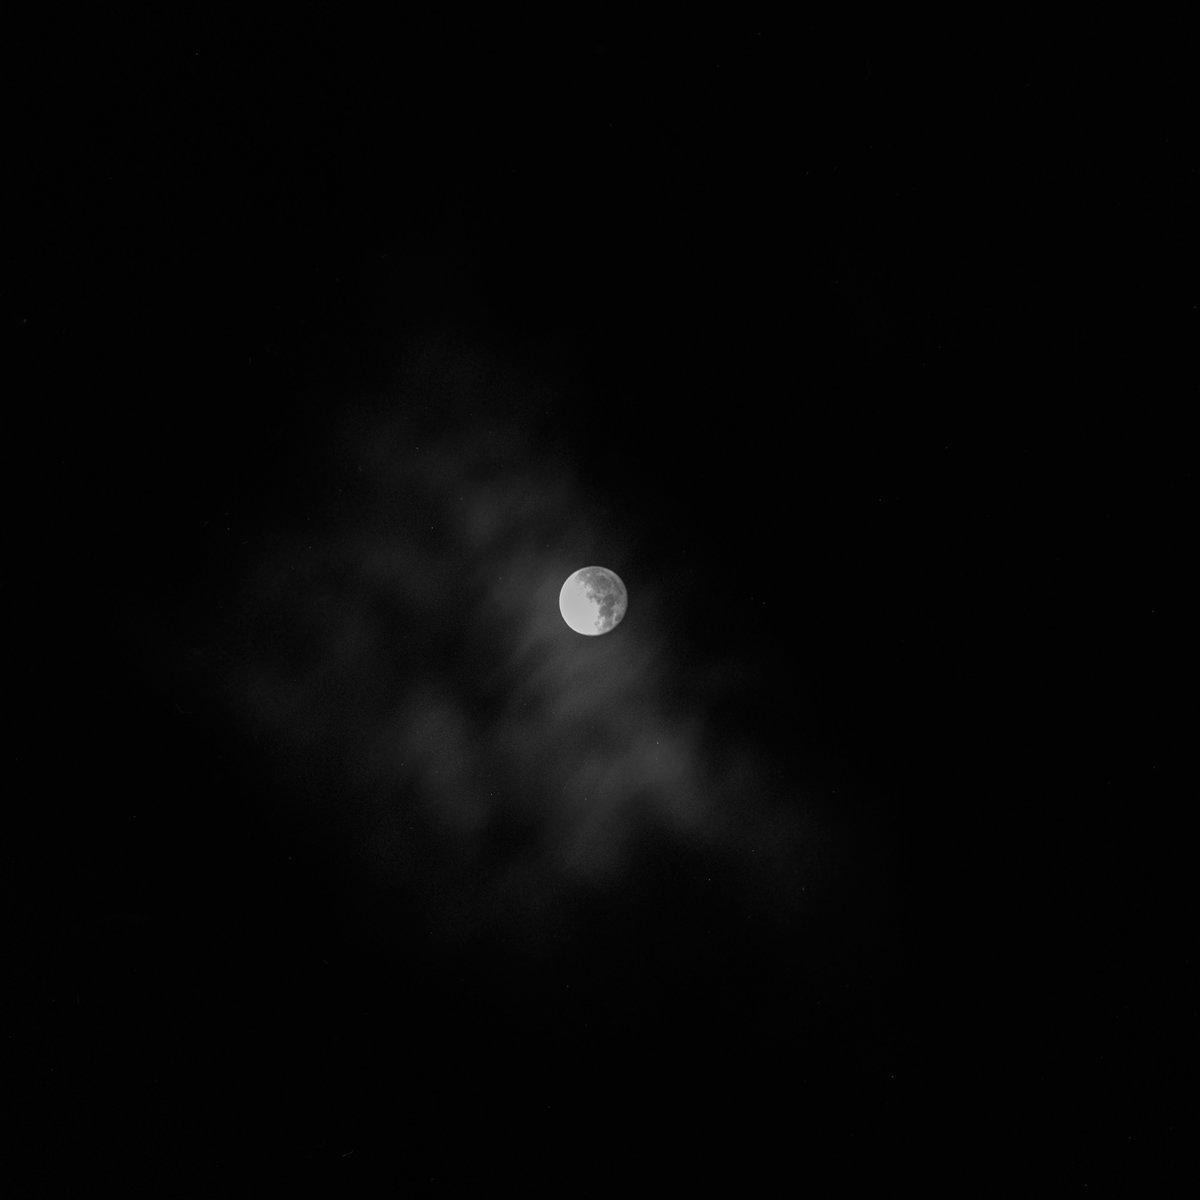 Moon3_full.thumb.jpg.bcef1d200a99a342de89dbc973c5d8f4.jpg